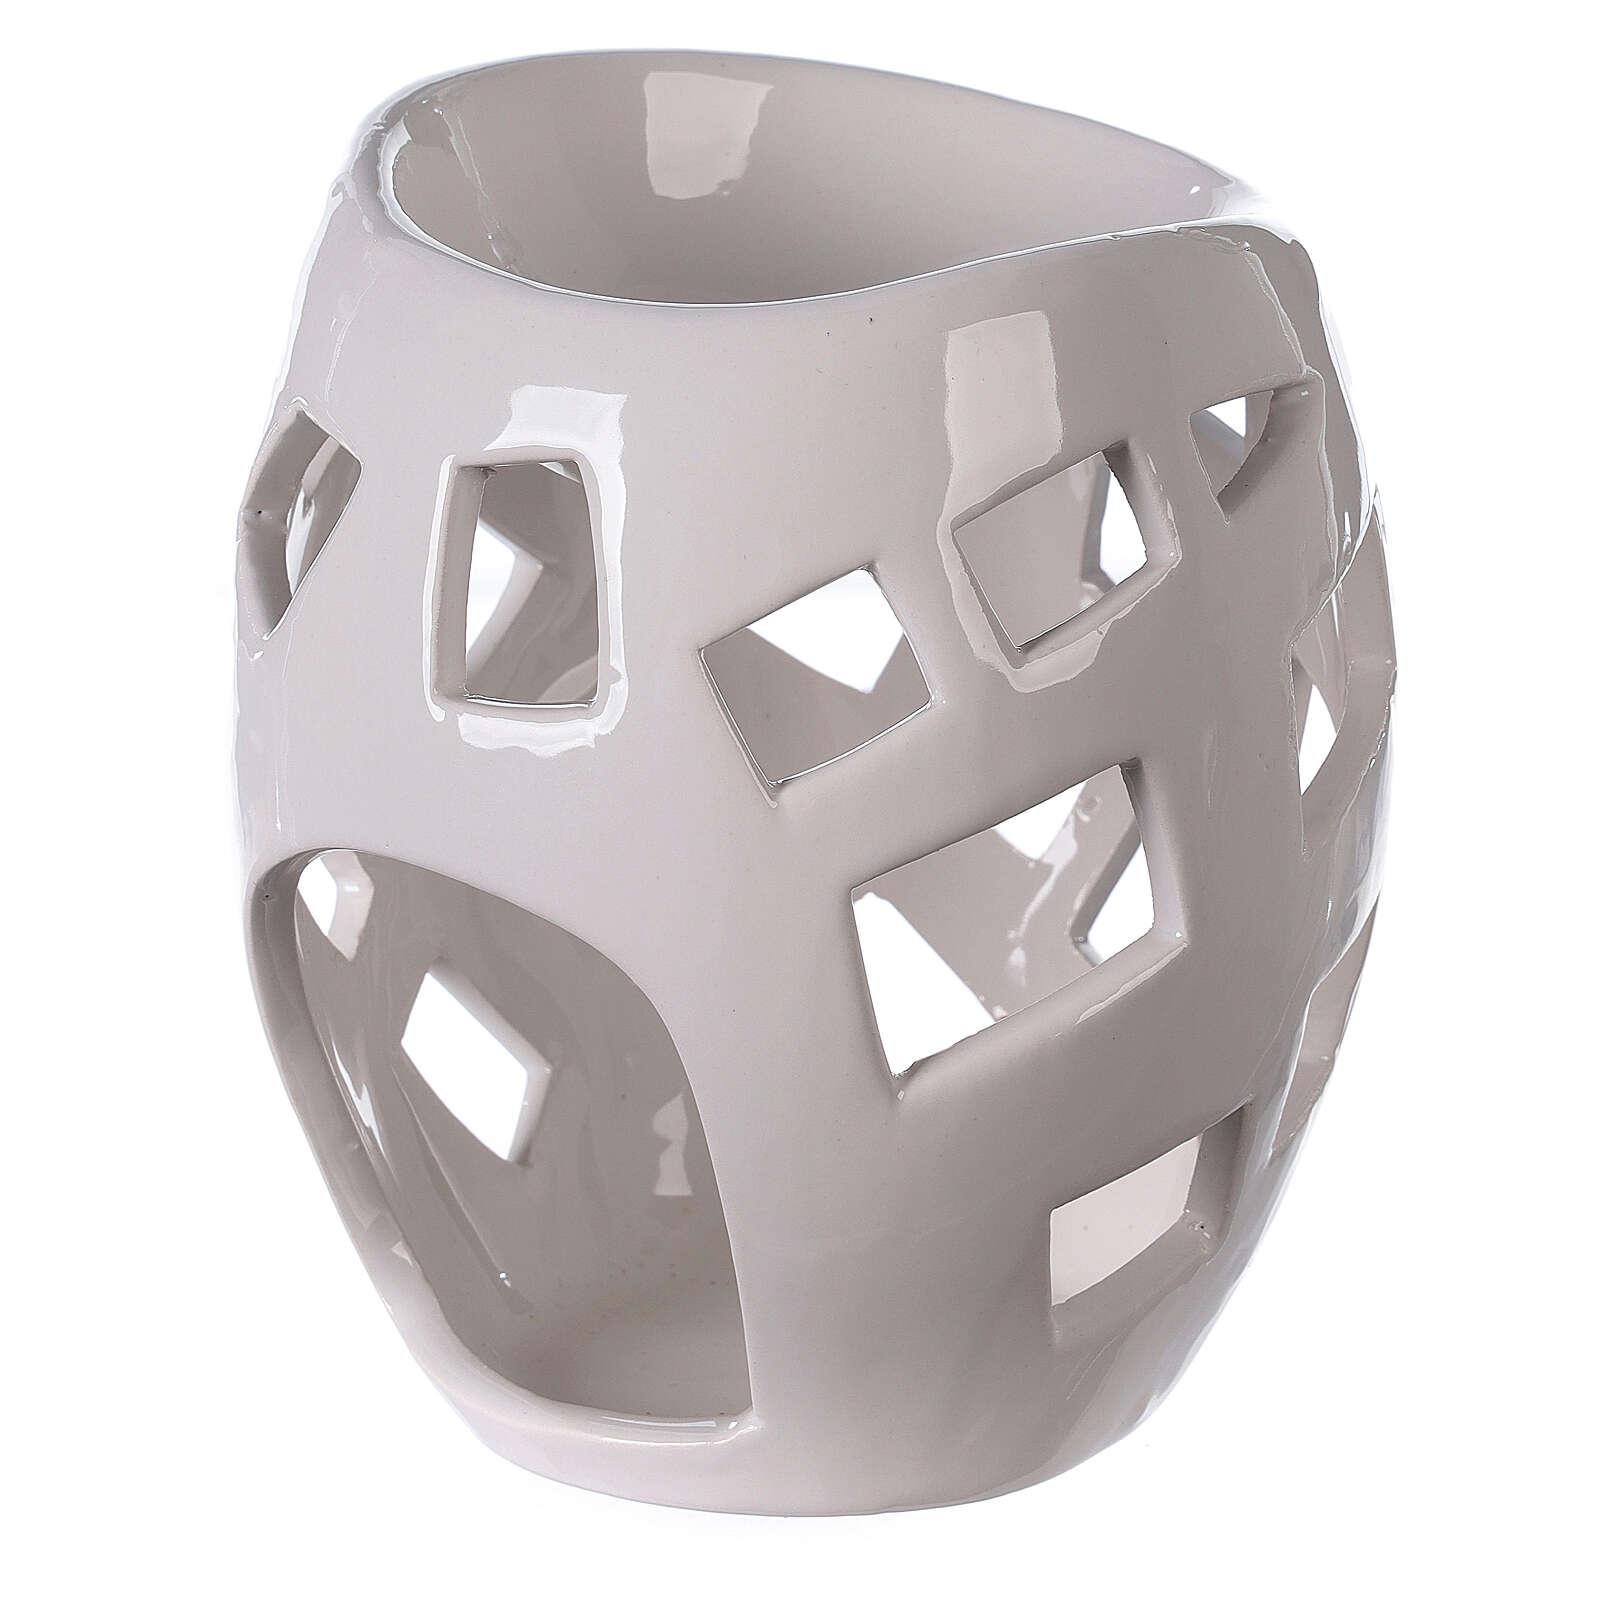 Pebetero esencias cerámica perforado blanco 9x12 cm 3